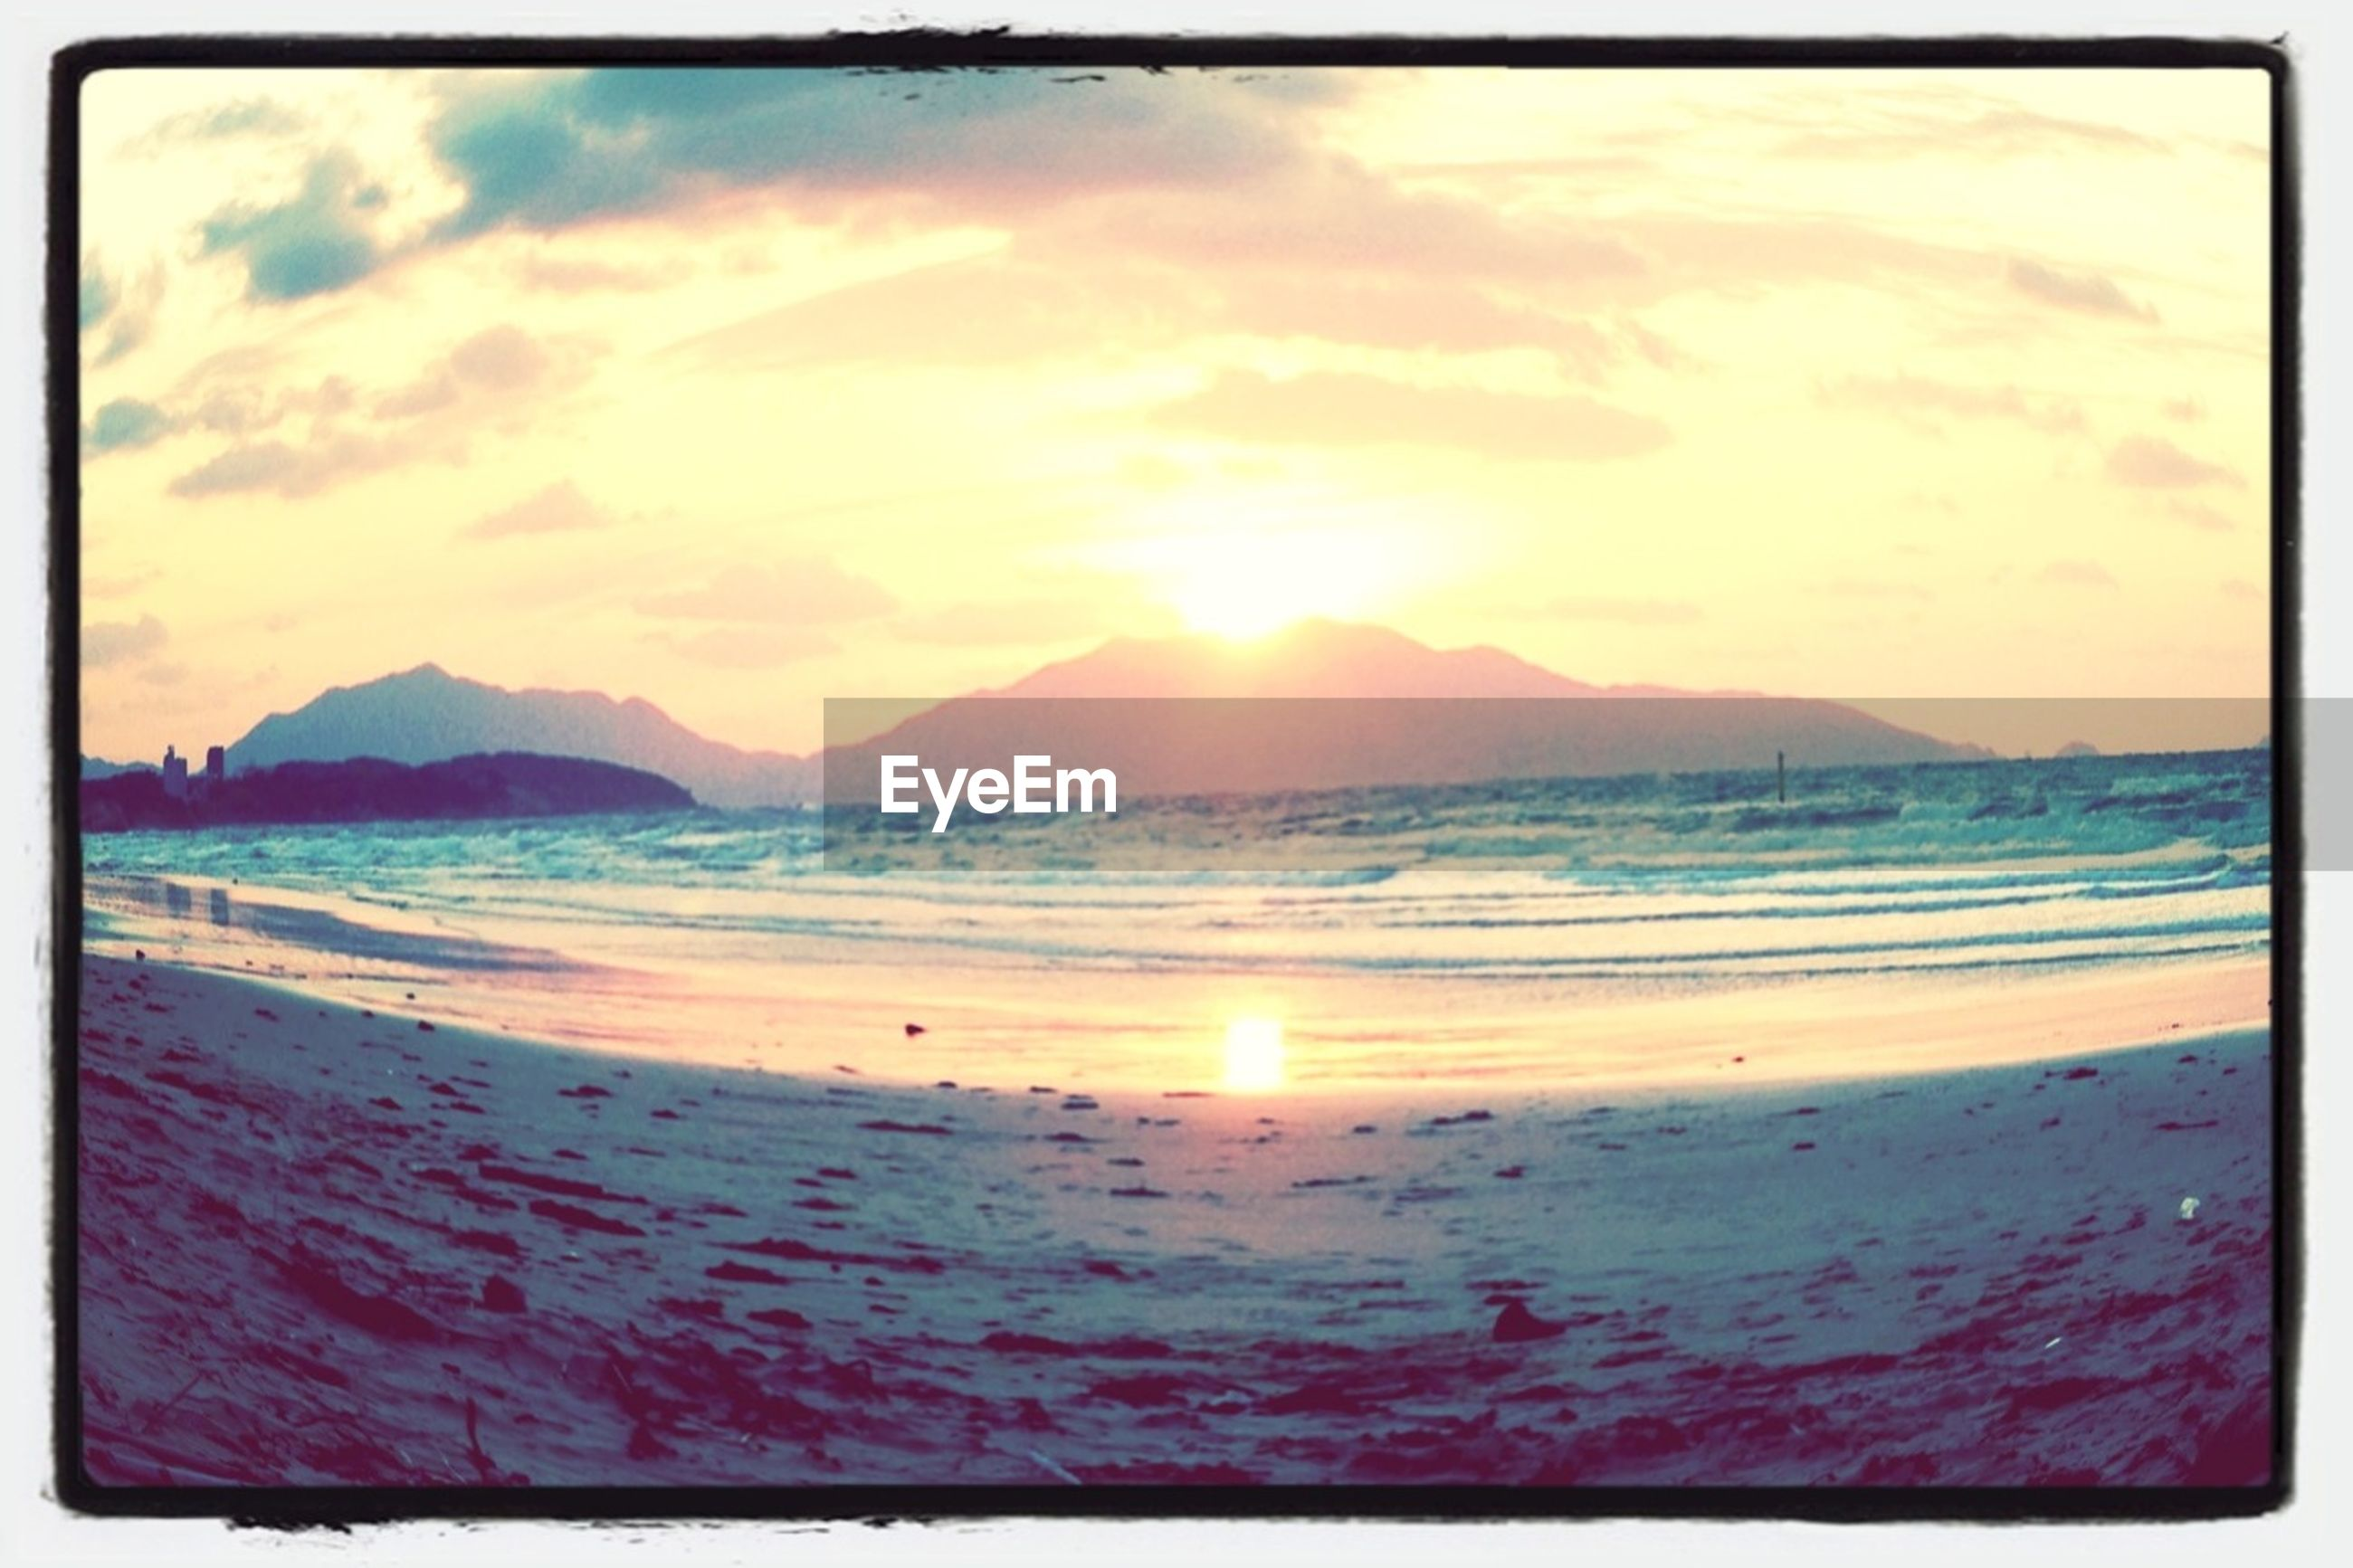 sea, beach, water, sunset, scenics, shore, sky, beauty in nature, tranquil scene, transfer print, sand, tranquility, sun, horizon over water, mountain, nature, cloud - sky, auto post production filter, idyllic, coastline